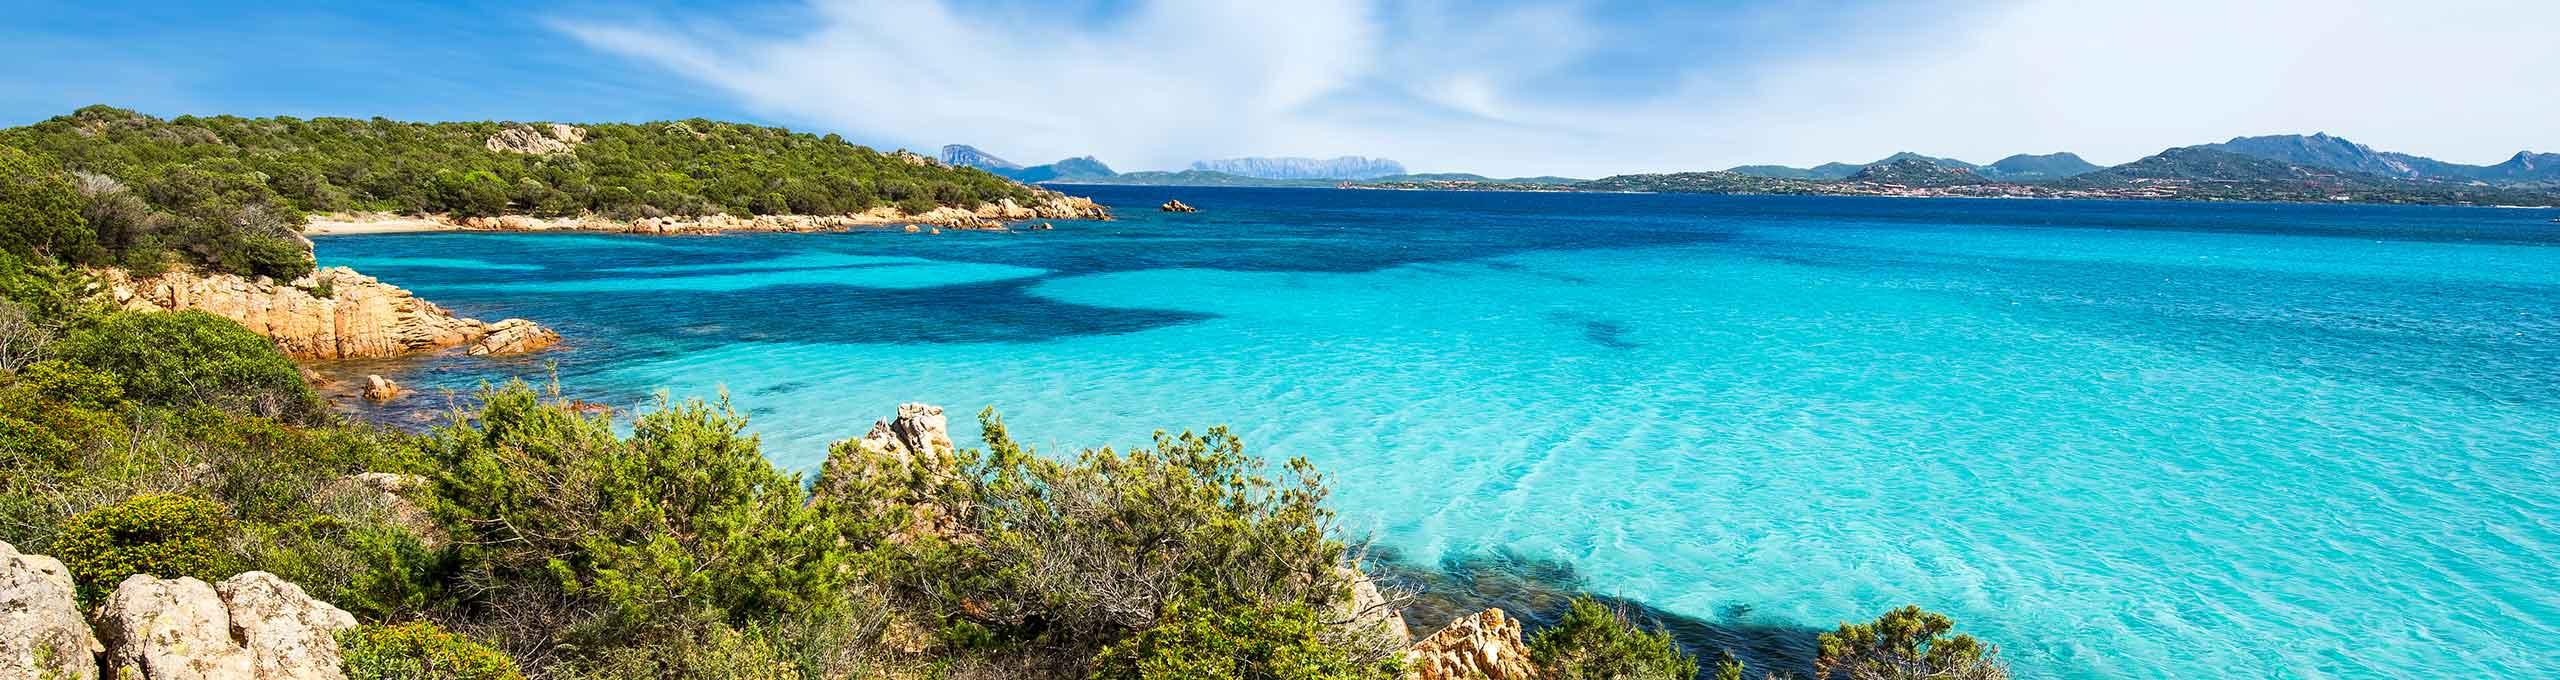 Olbia, spiaggia Petra Roja